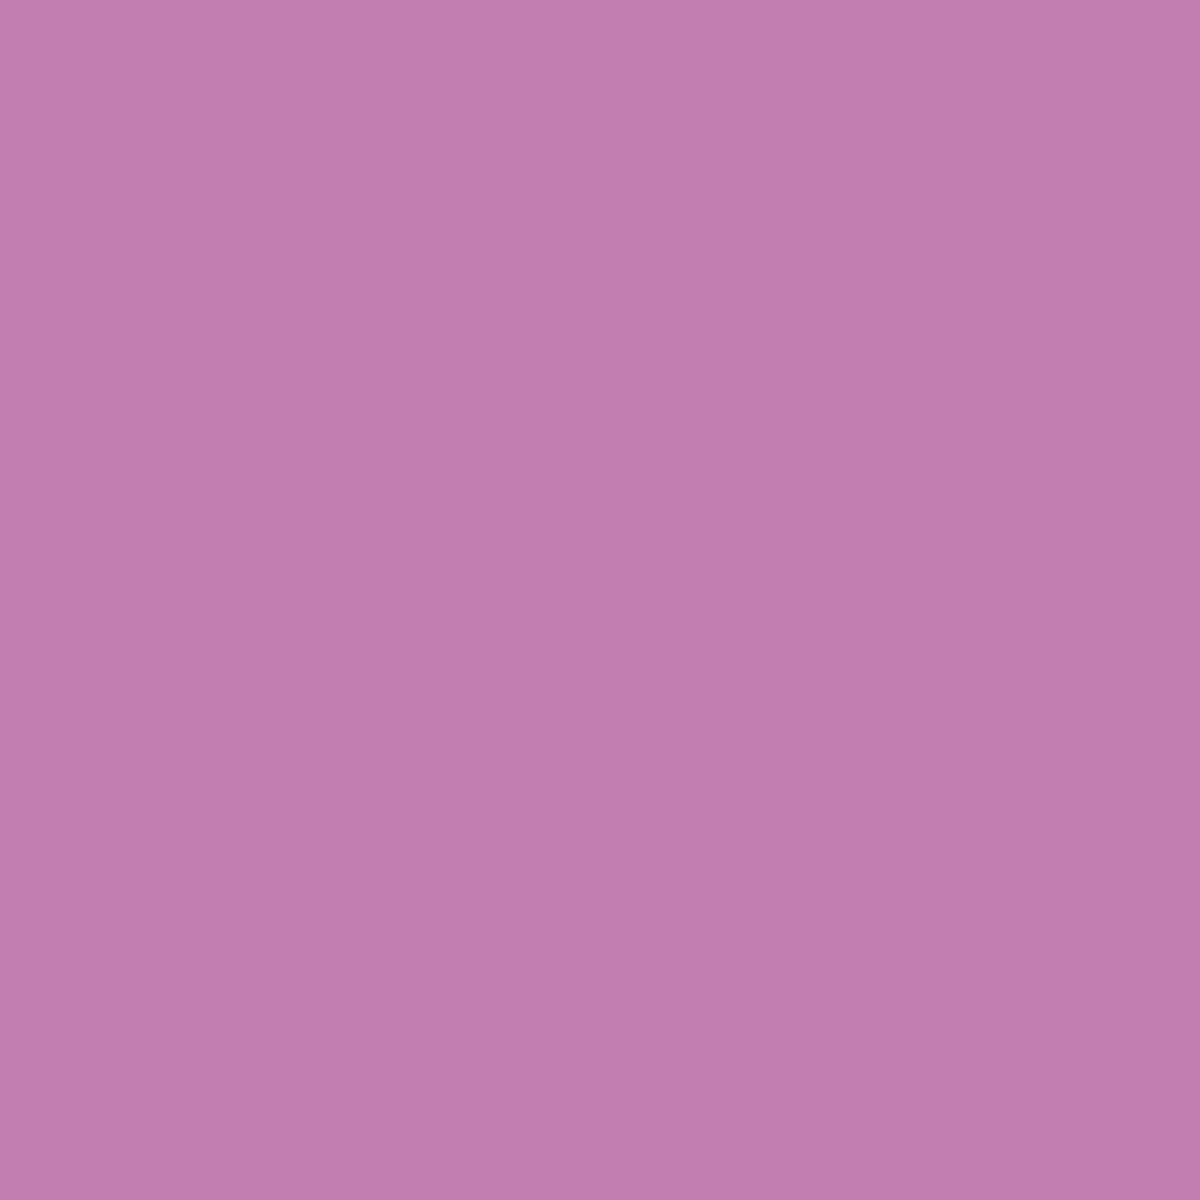 Riley Blake, Confetti Solid Violet